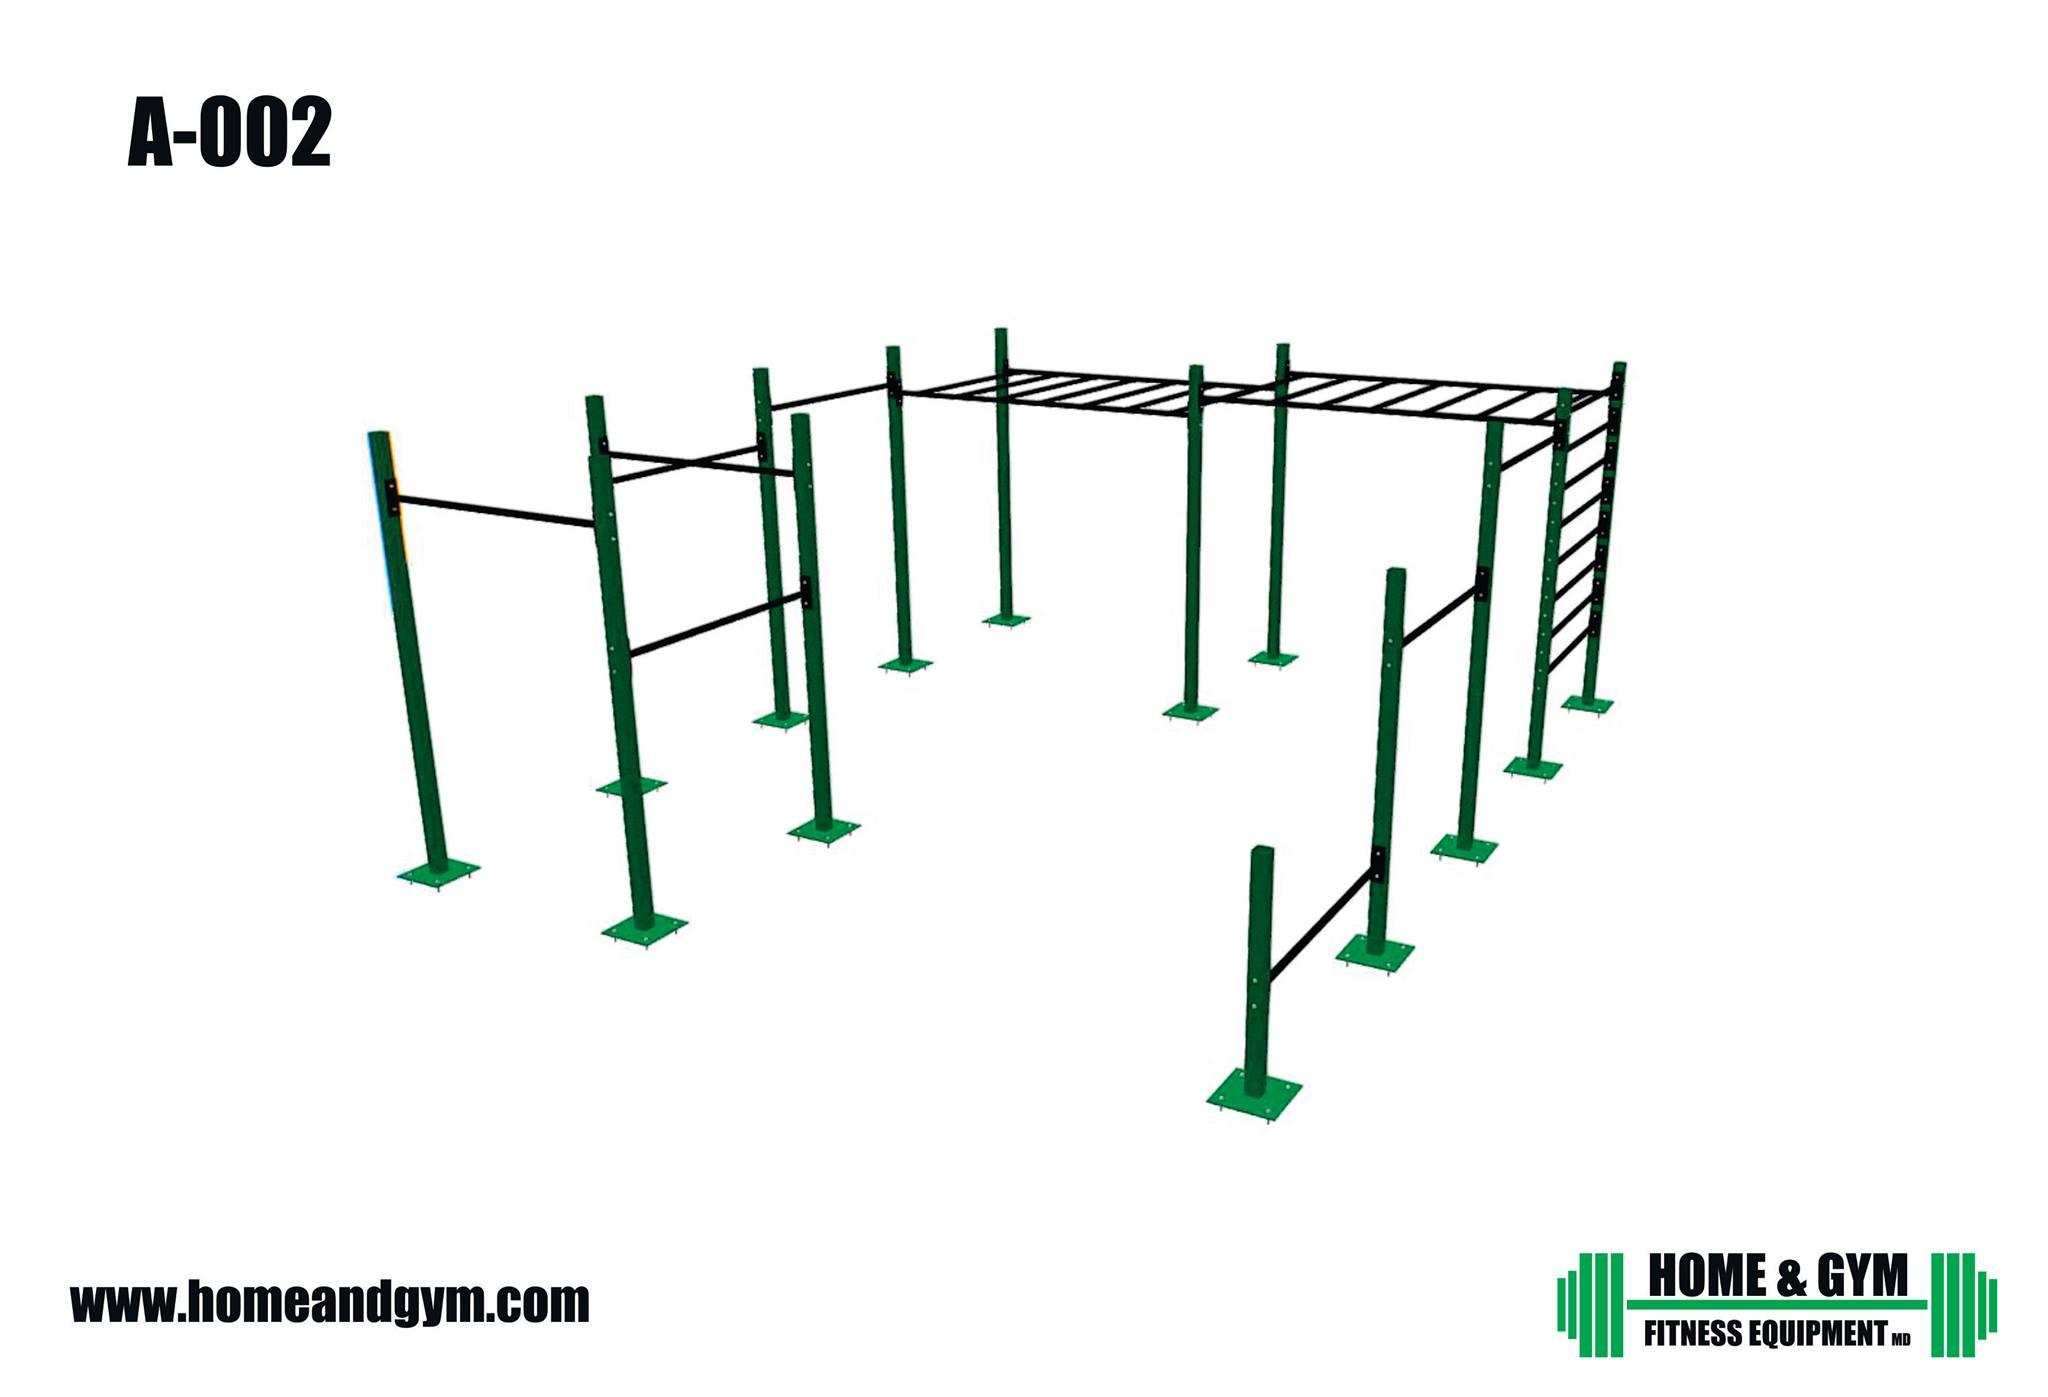 Equipos para gimnasio aparatos de gimnasia y gimnasio en for Gimnacio o gimnasio